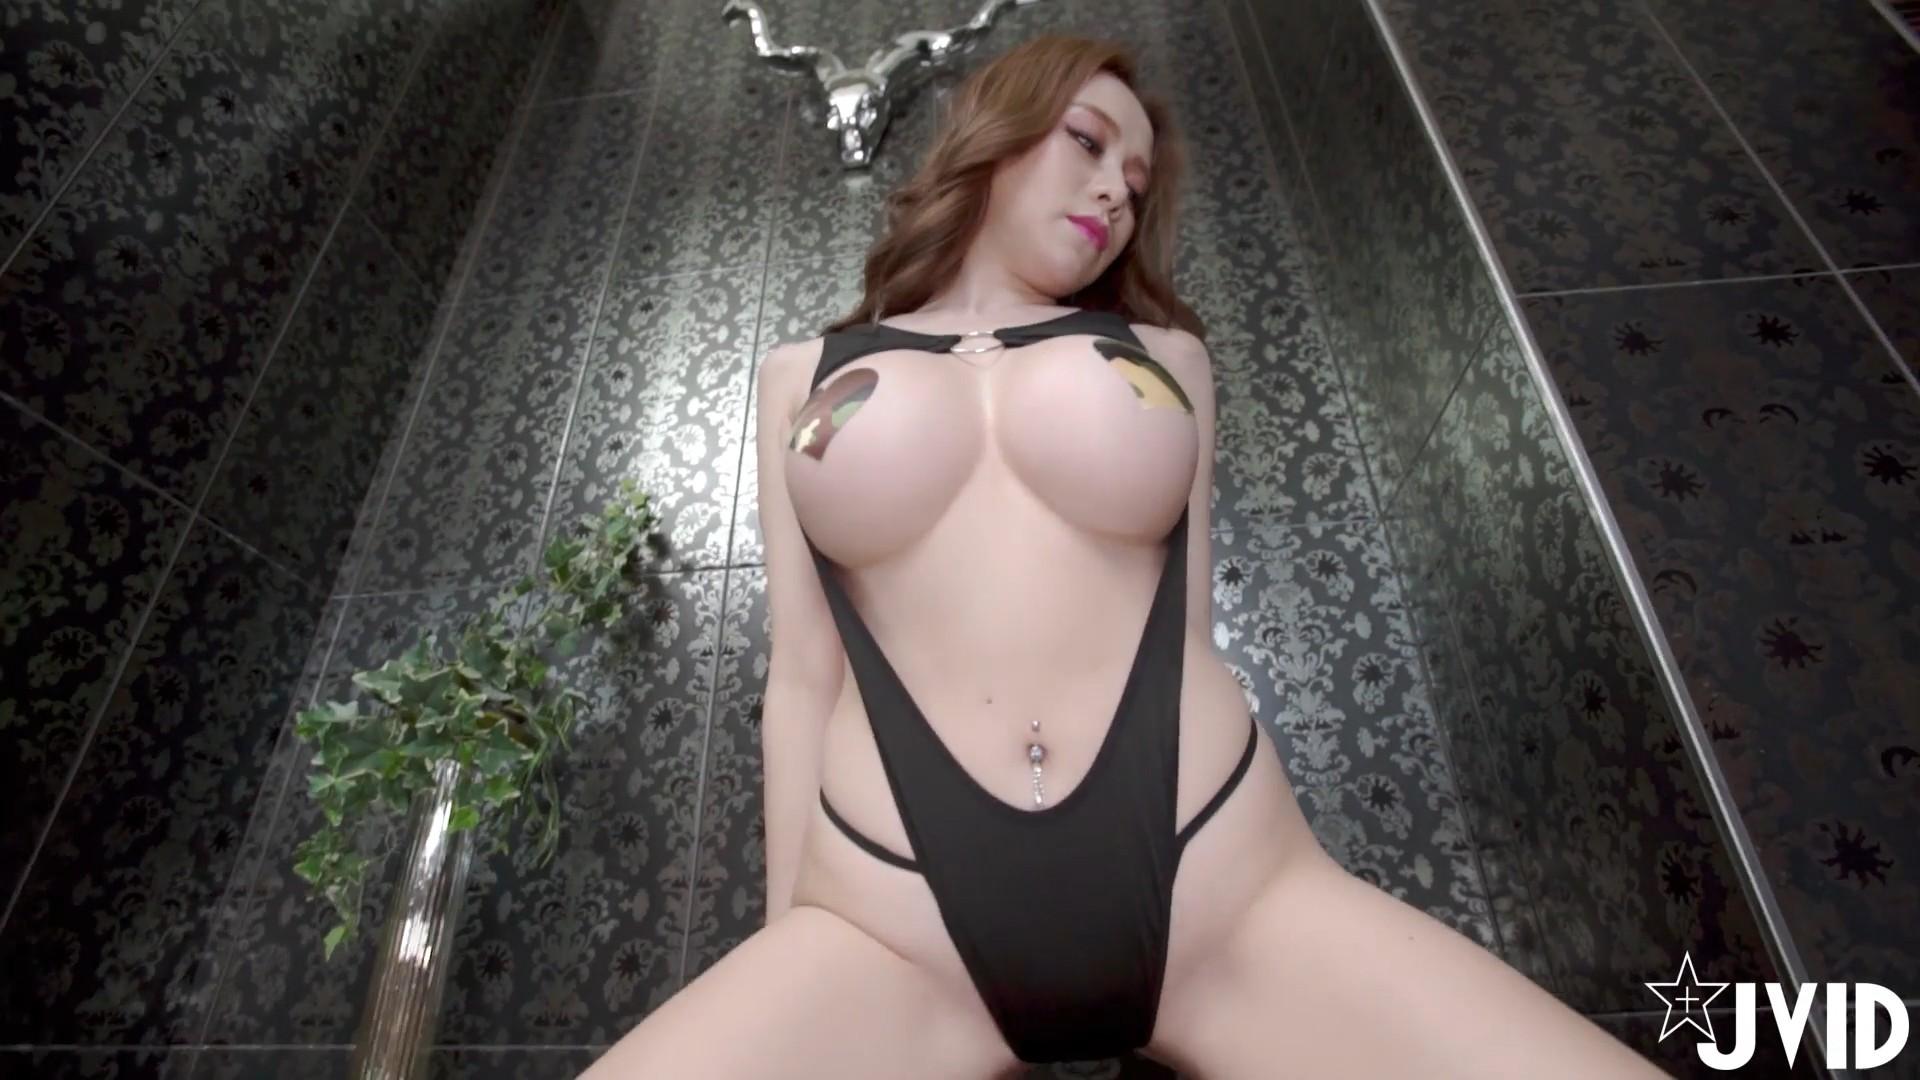 [JVID视频]巨乳剩下胸貼!張語昕性感力無限大[1V/212MB]